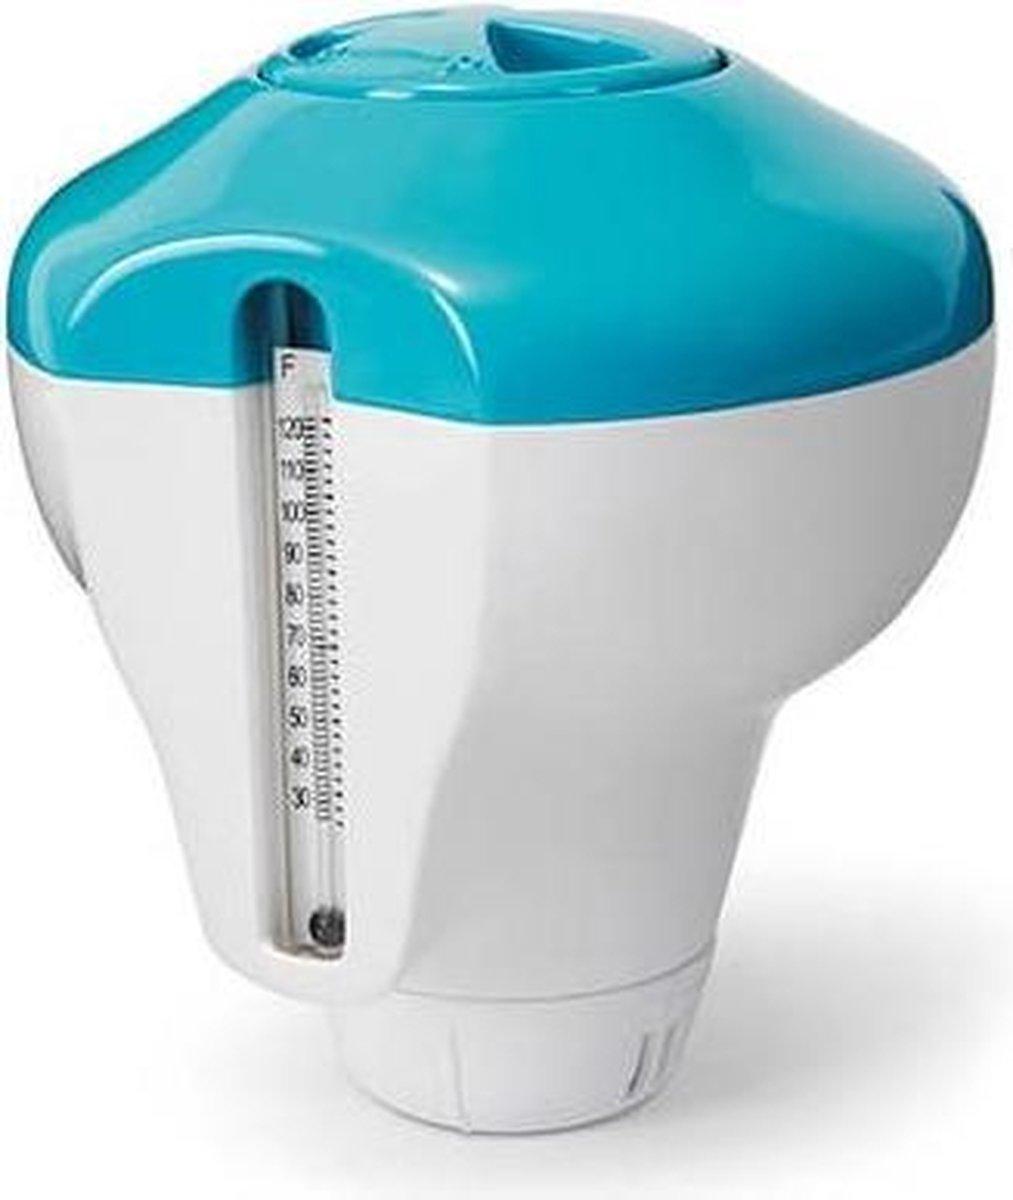 Intex 2-in-1 chloordrijver met thermometer